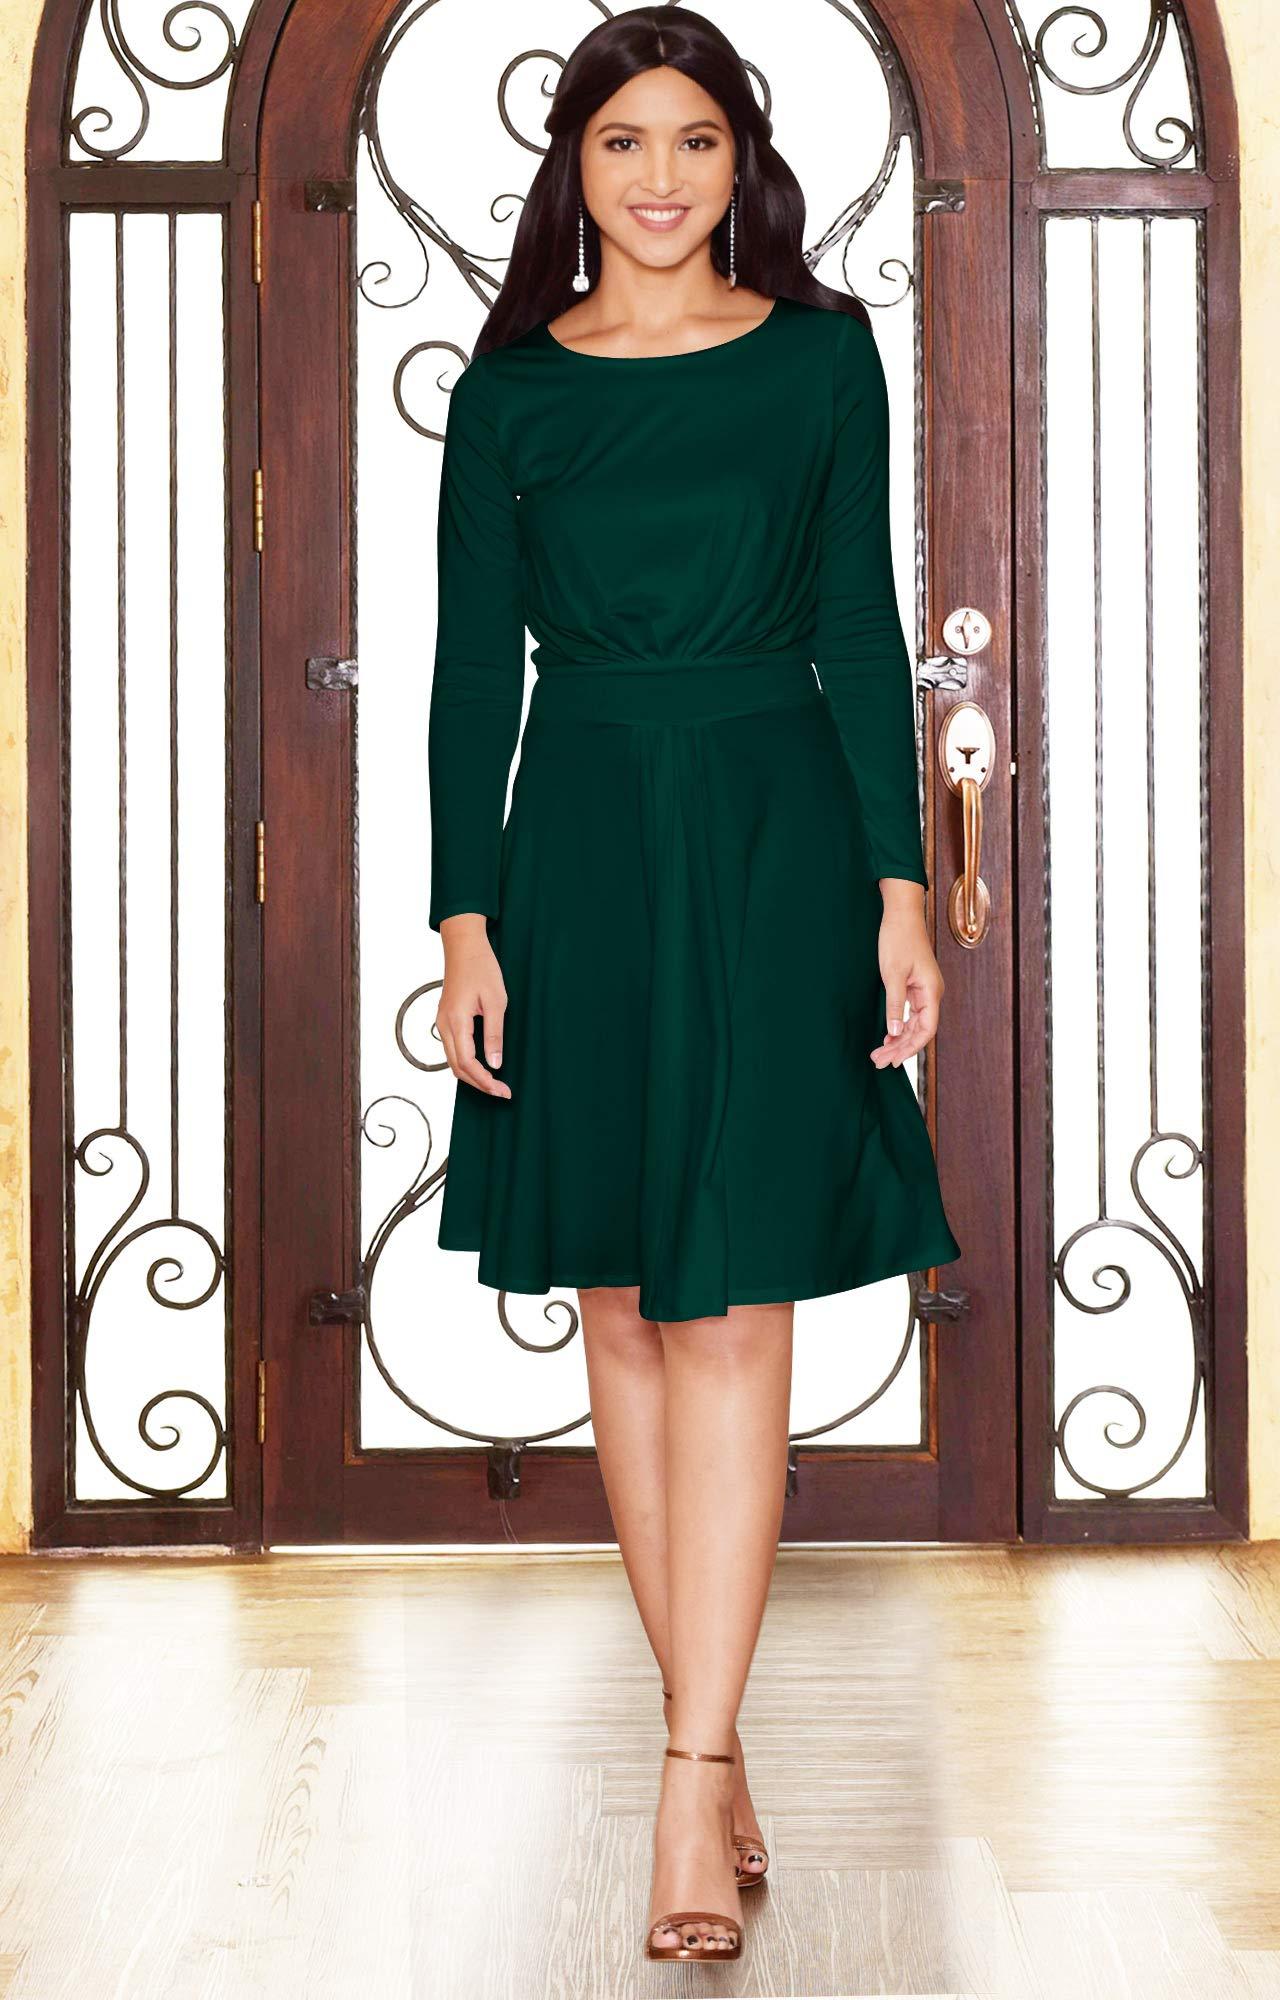 0effe86fce65 ... Fall Winter Formal Flowy Work Empire Waist Knee Length Vintage Swing  Modest Cute Abaya Mini Midi Dress Dresses